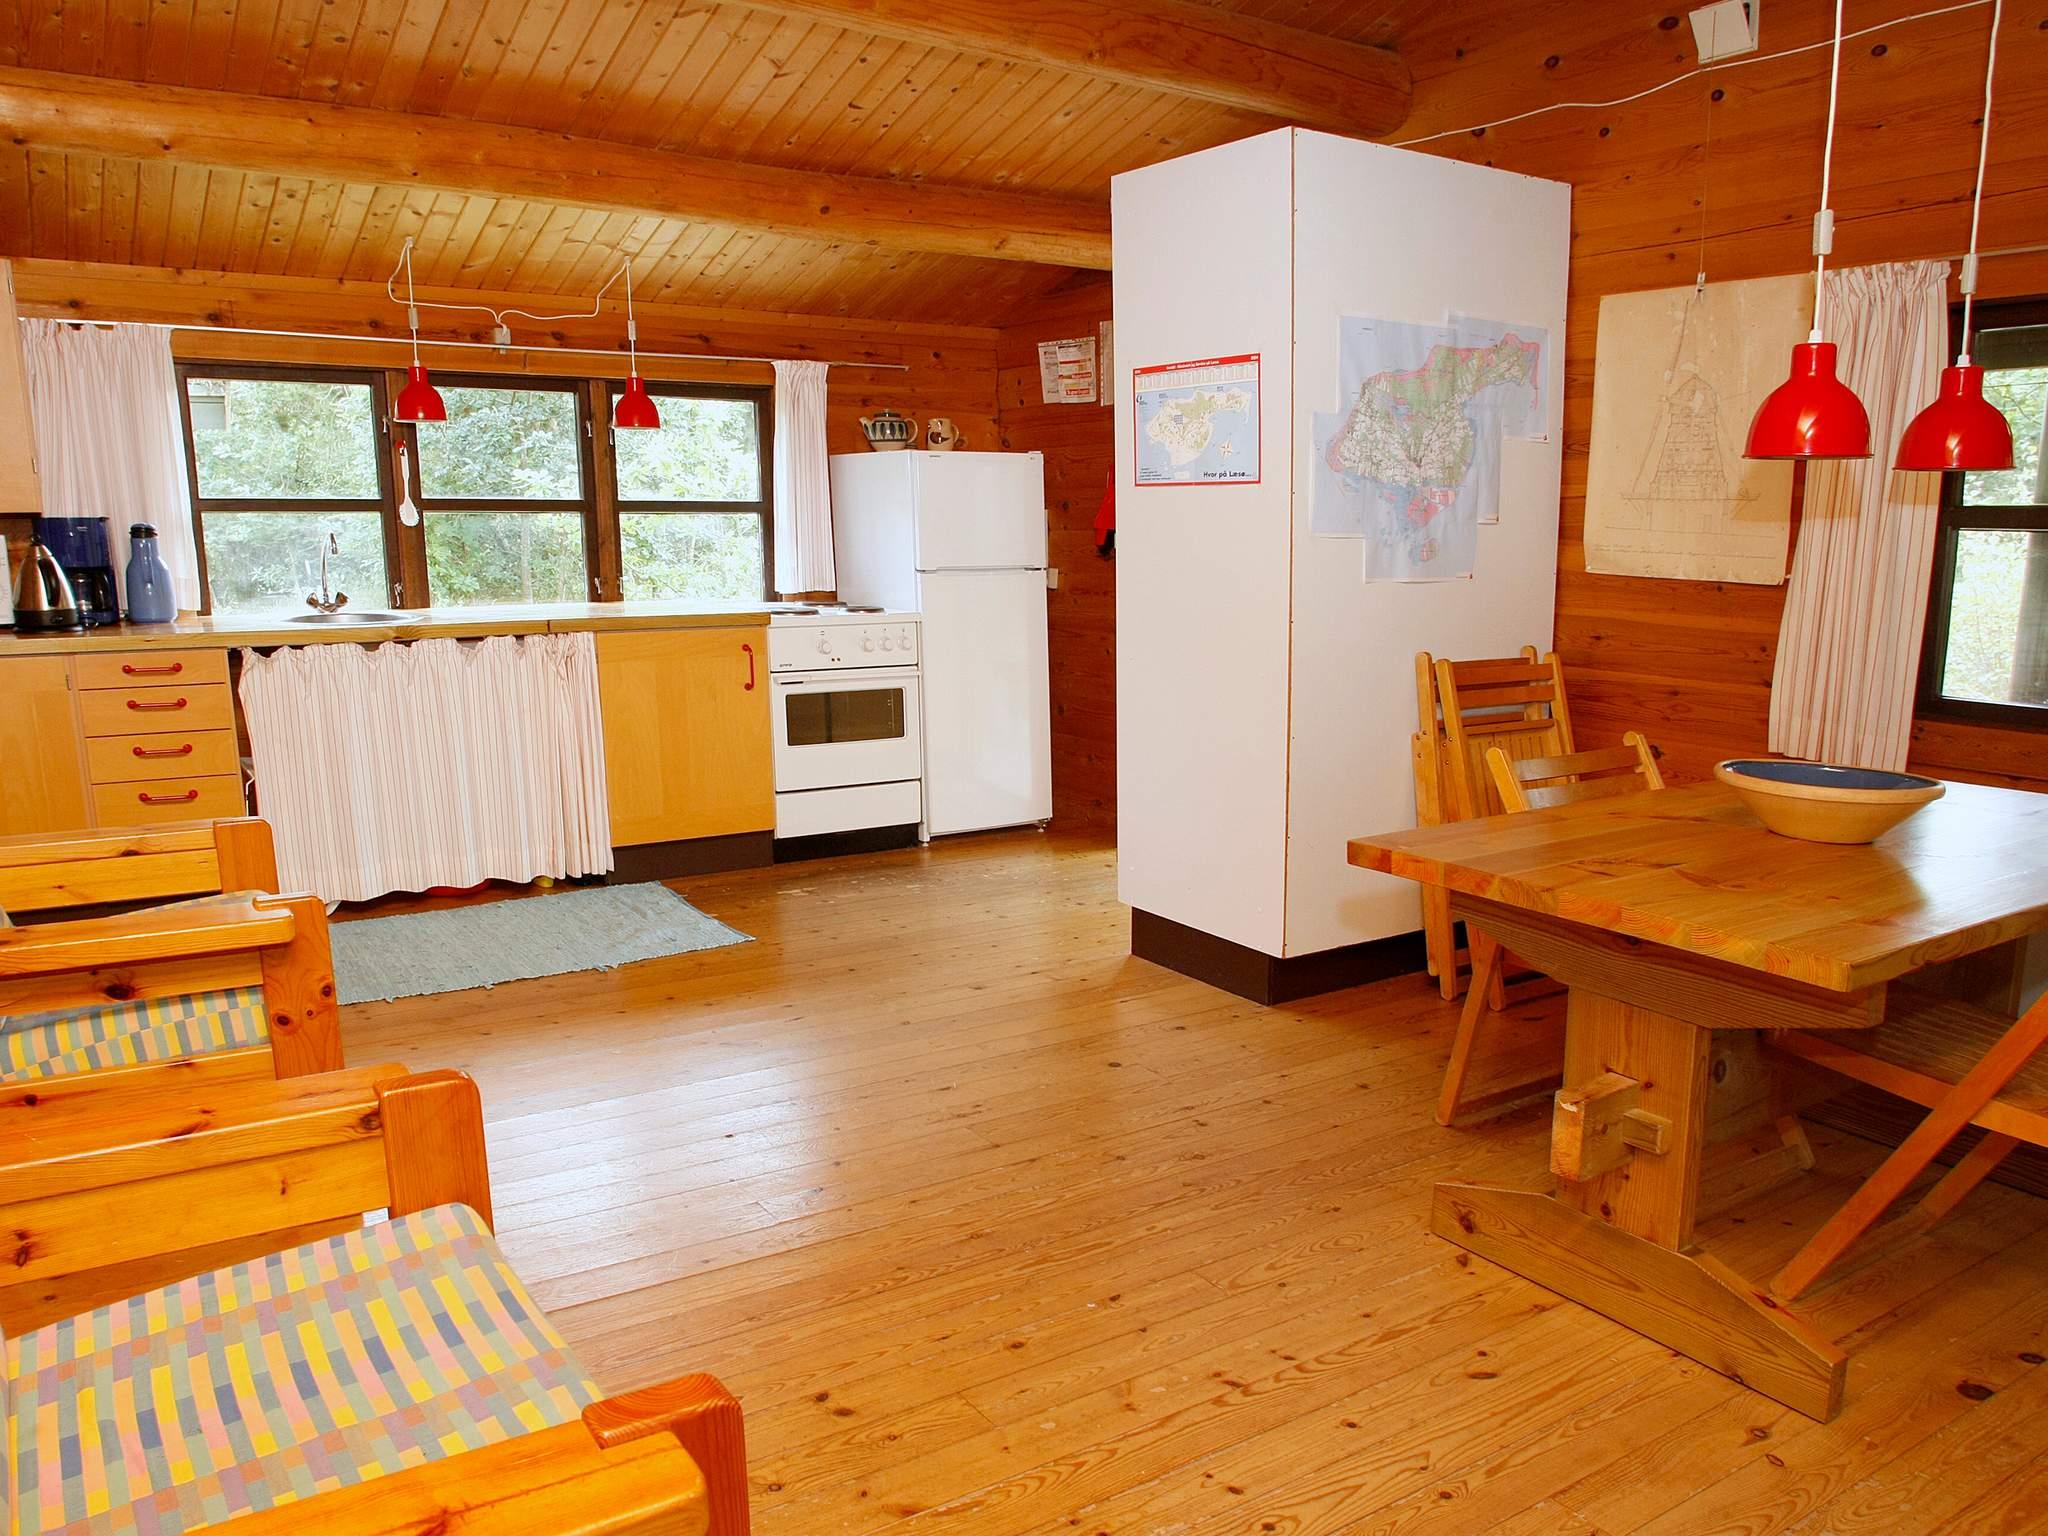 Ferienhaus Læsø/Vesterø (88198), Læsø, , Læsø, Dänemark, Bild 4